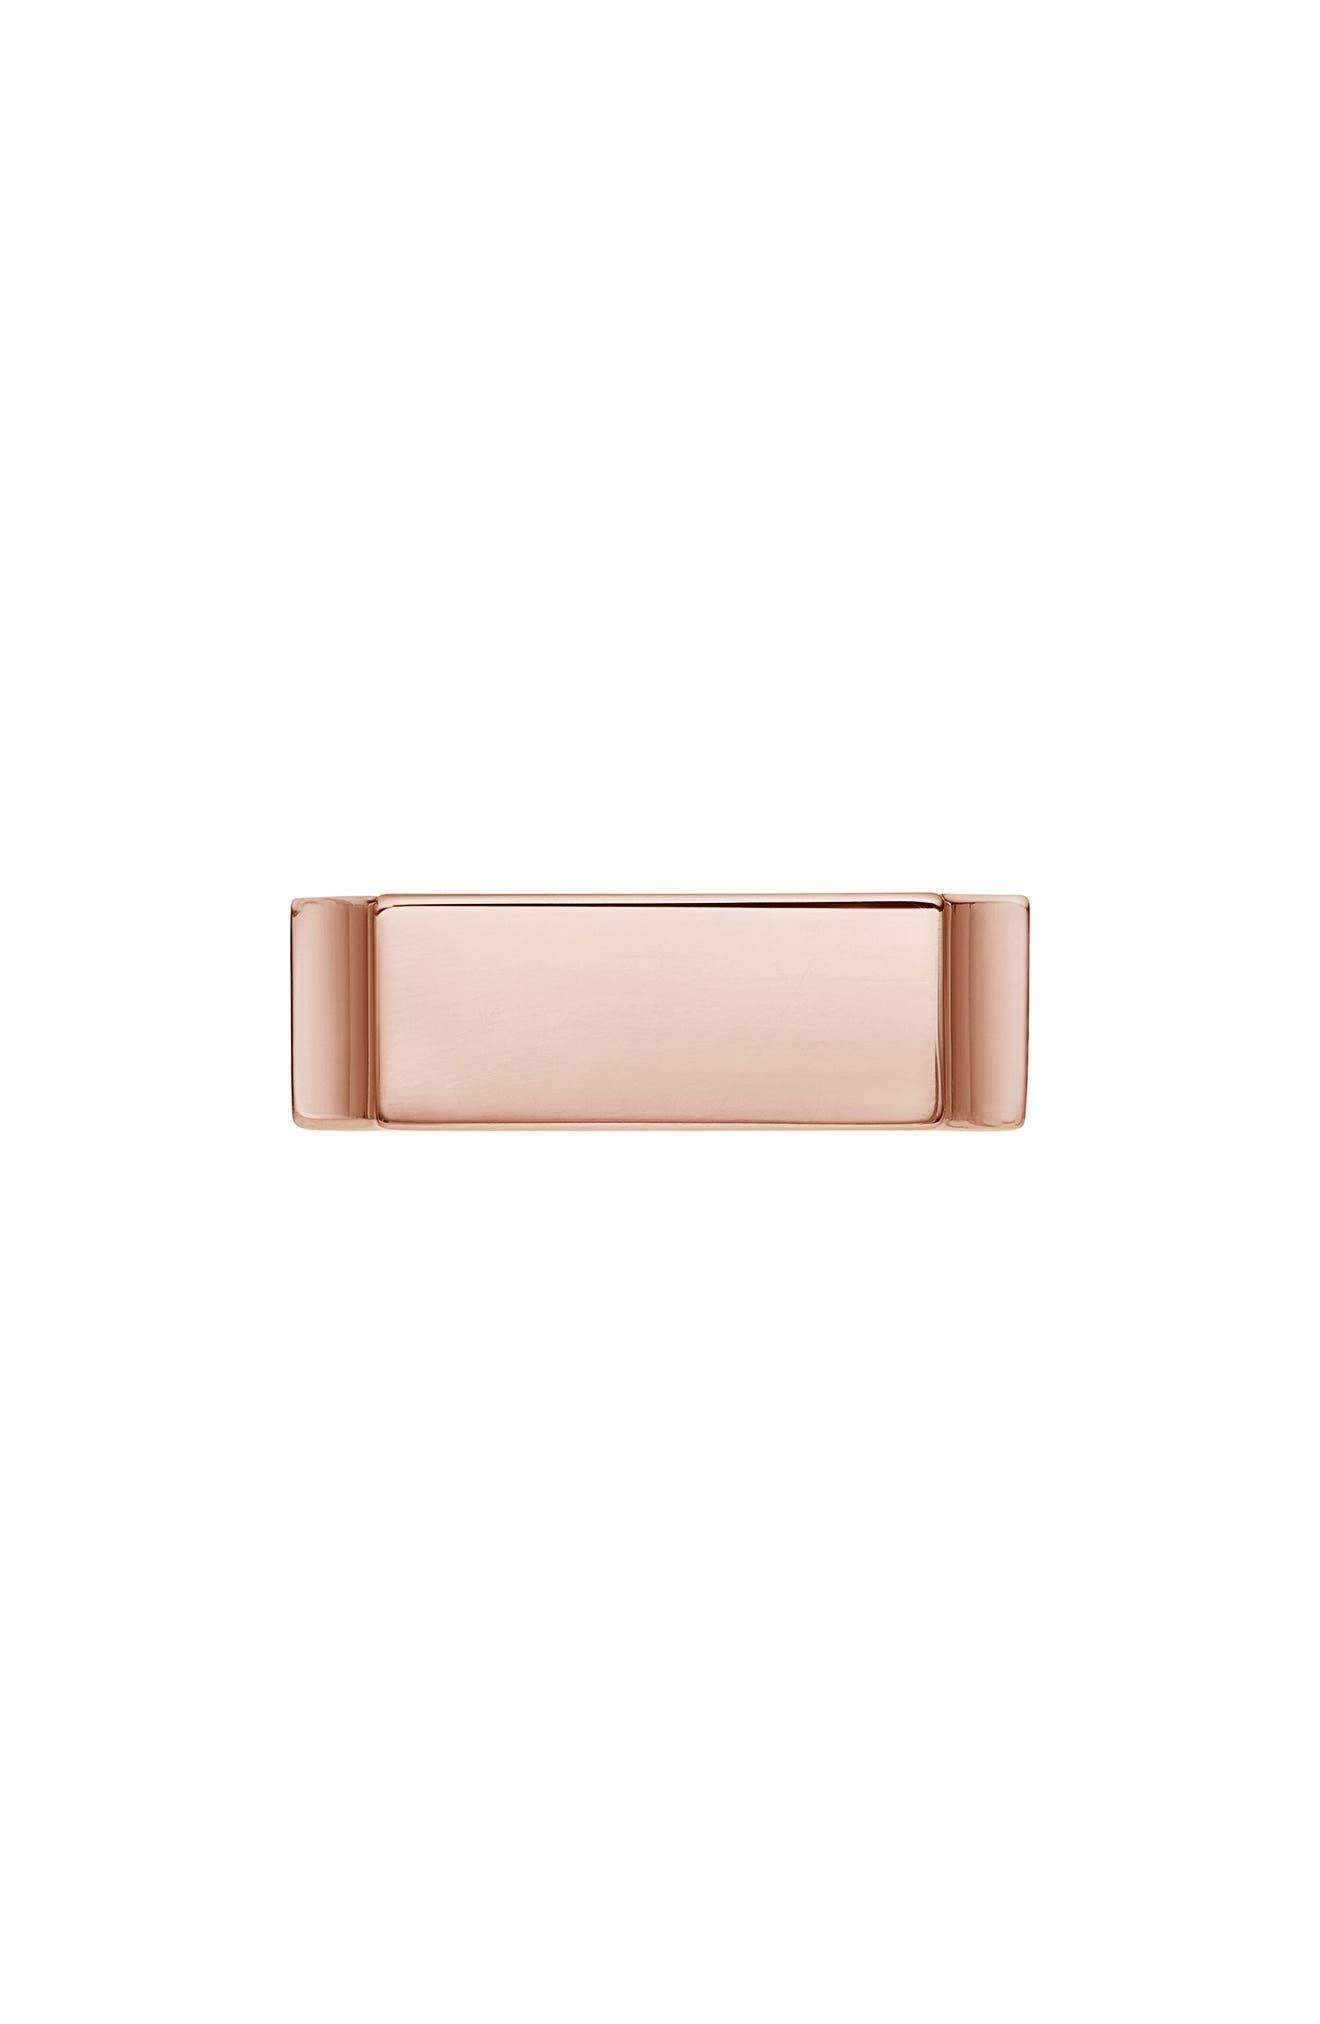 MONICA VINADER, Engravable Wide Signature Ring, Main thumbnail 1, color, ROSE GOLD